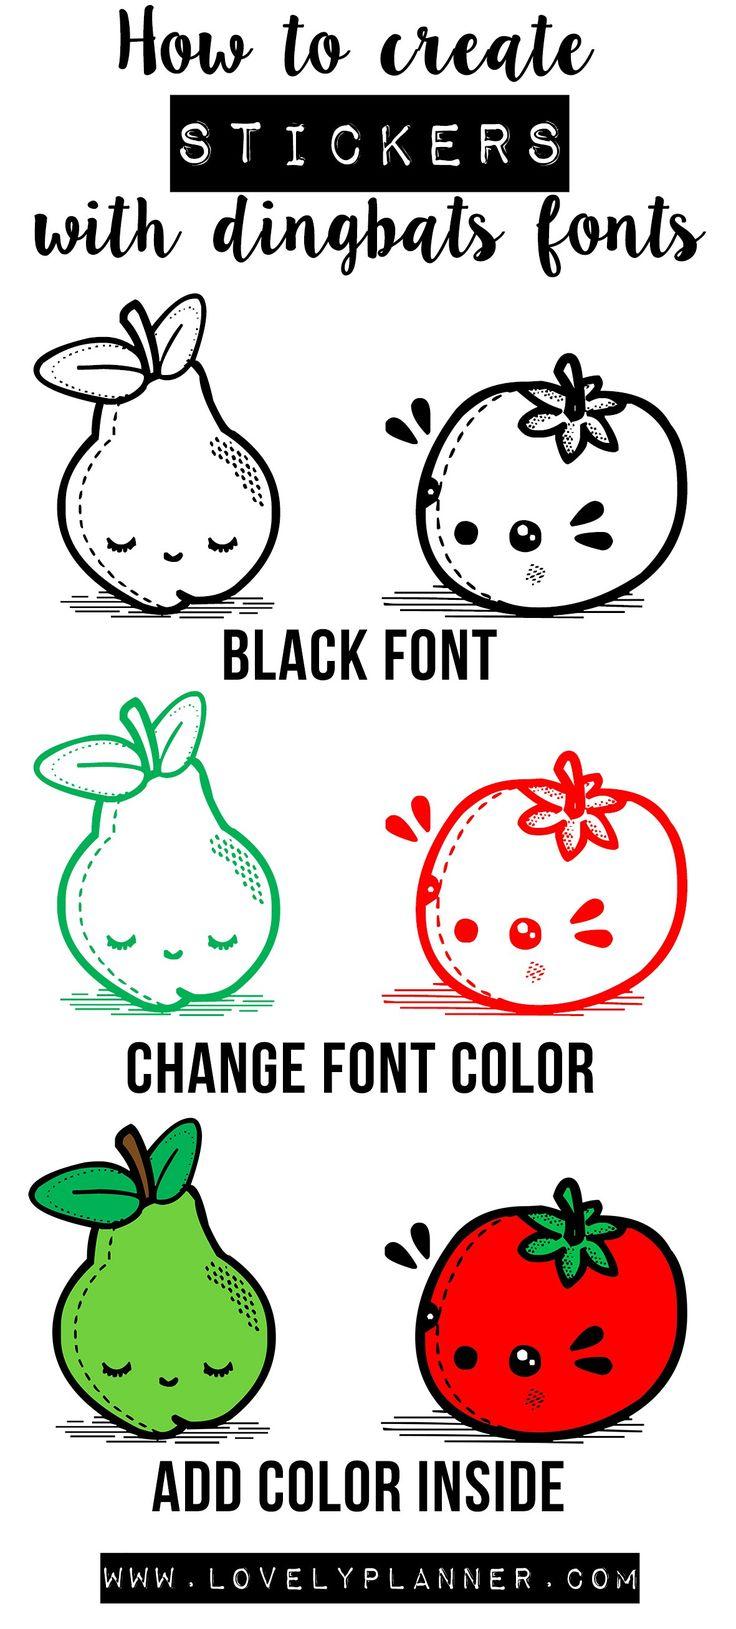 17 best ideas about Free Dingbat Fonts on Pinterest | Dingbat ...